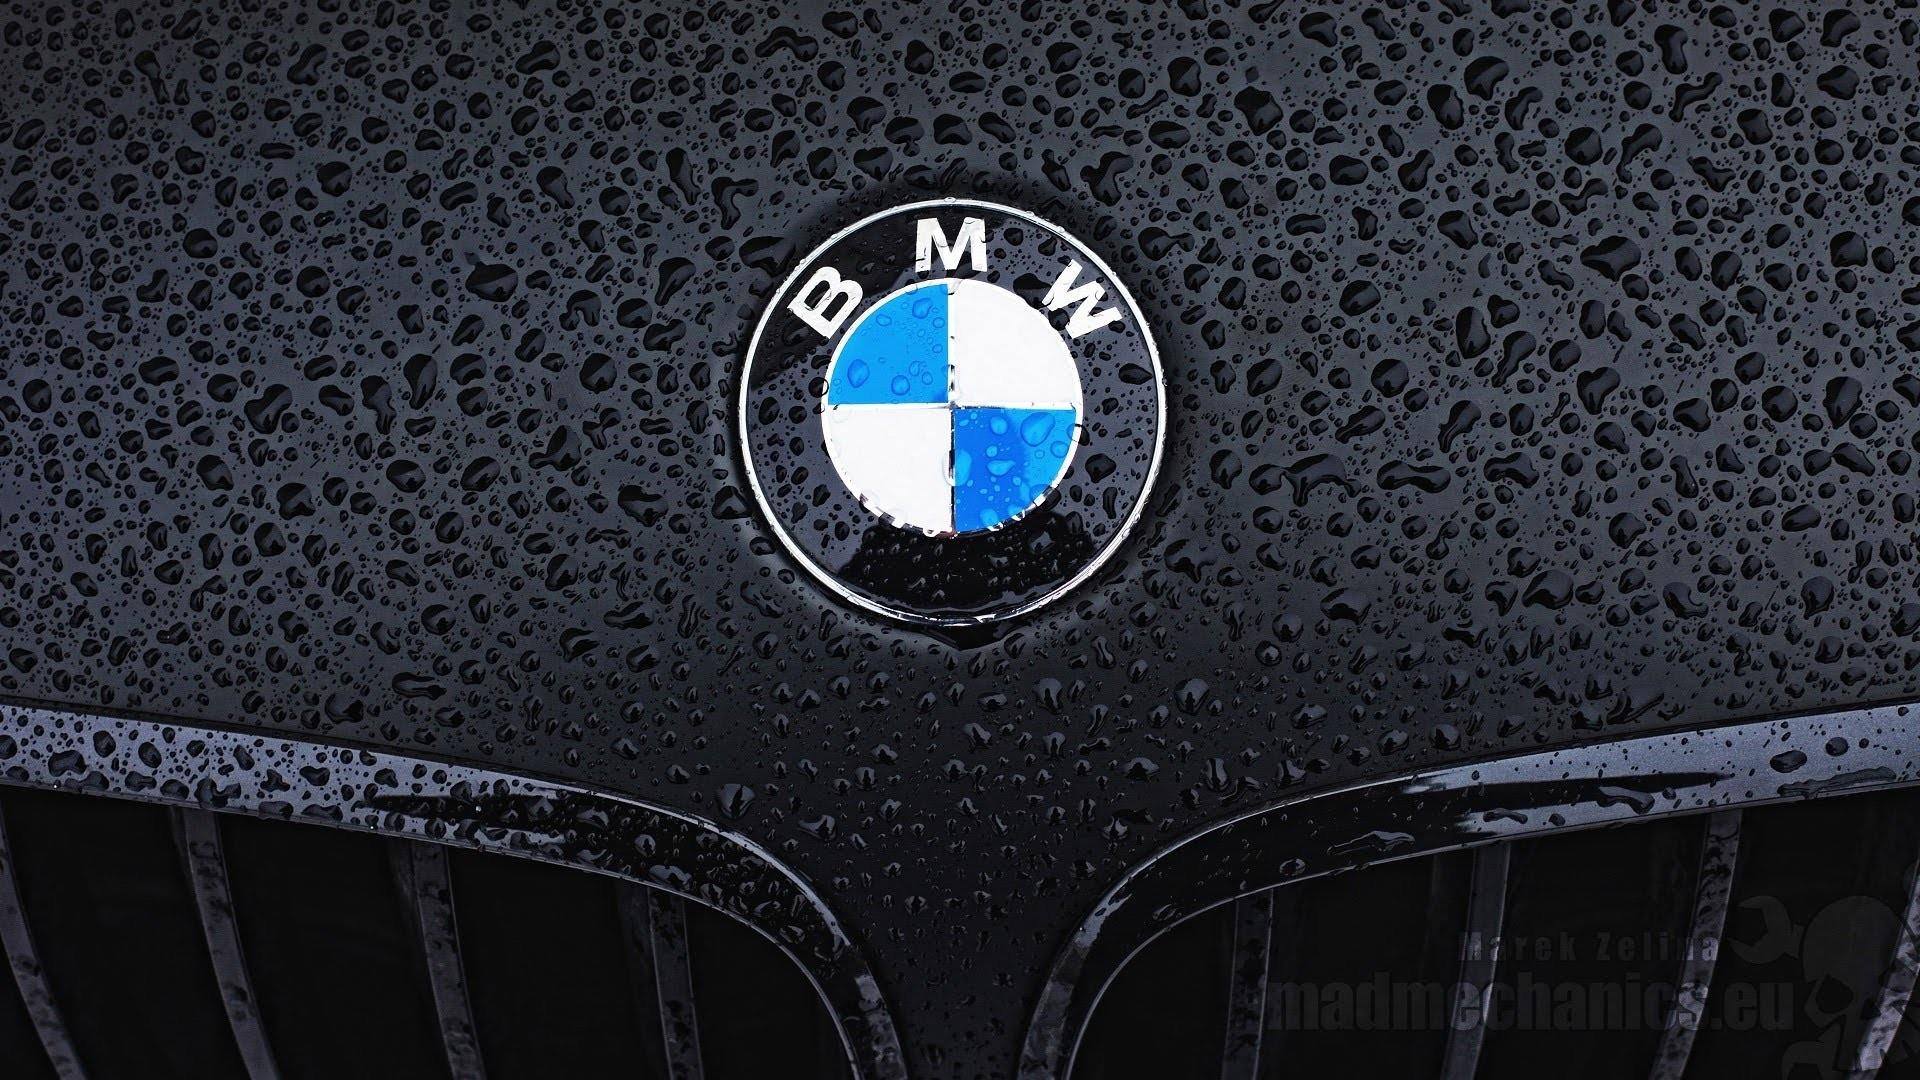 Car Logo Wallpaper (67+ images)